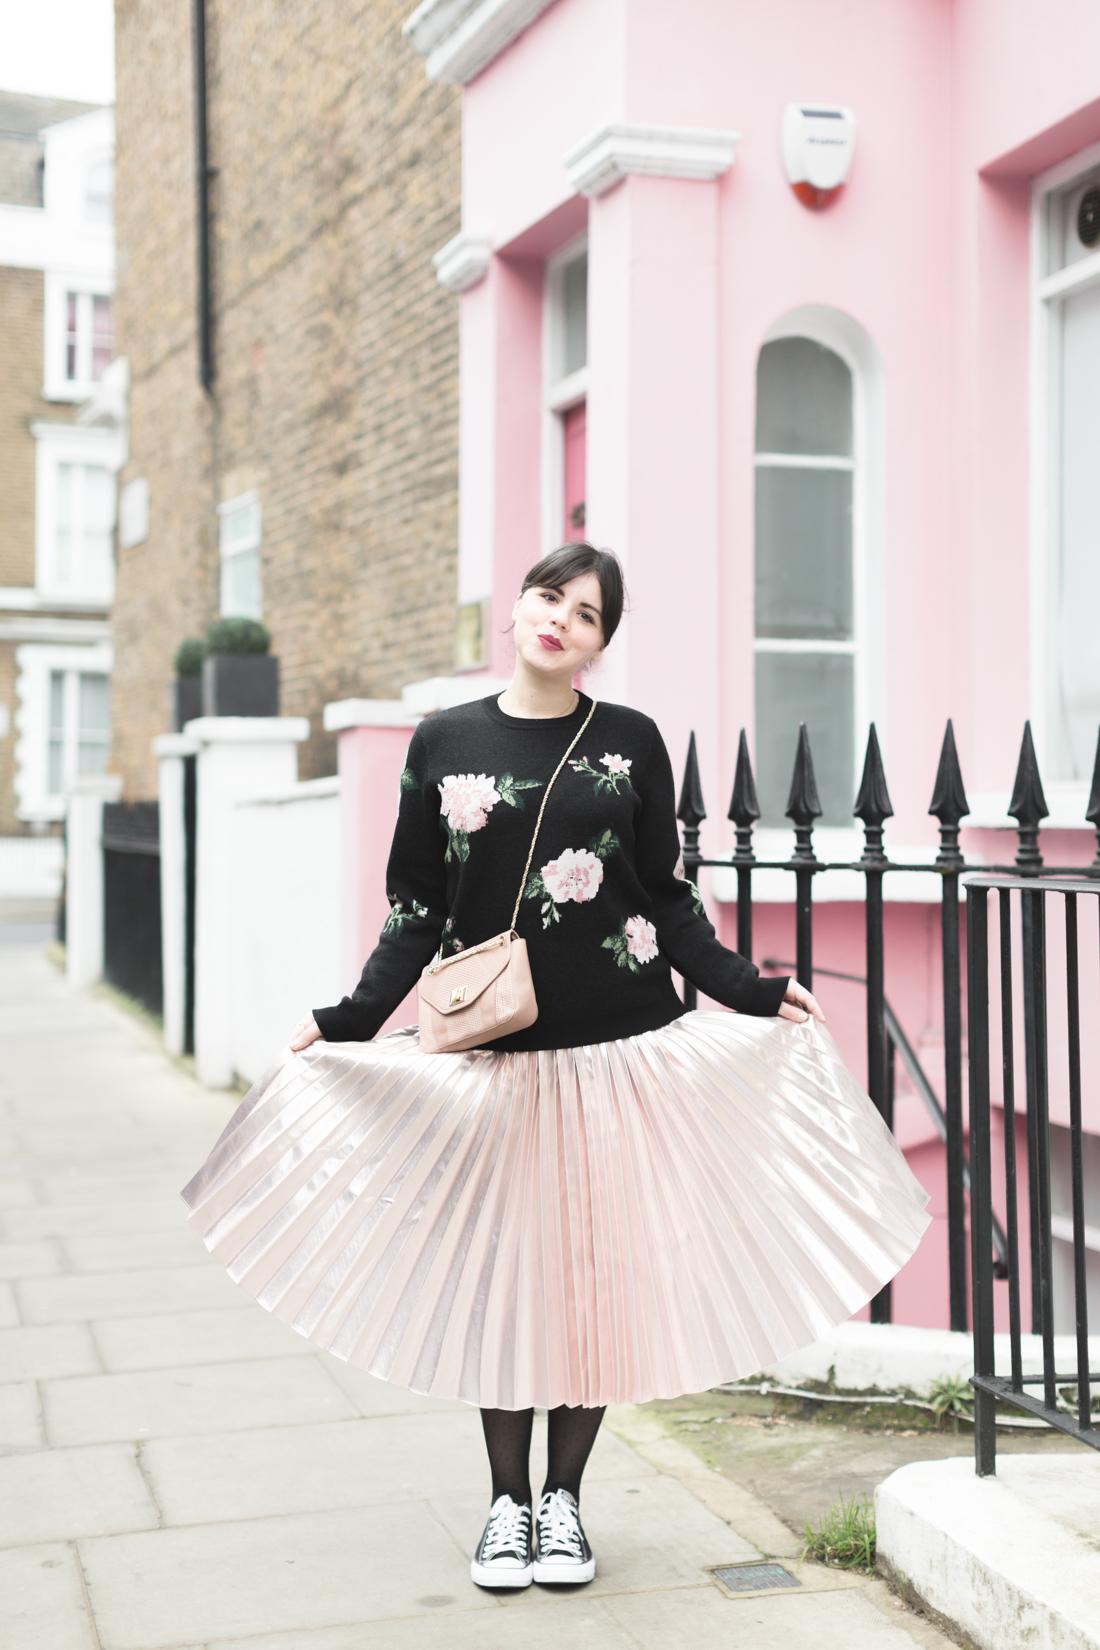 1100pinklondon copyright Pauline paulinefashionblog com 1 Pink London